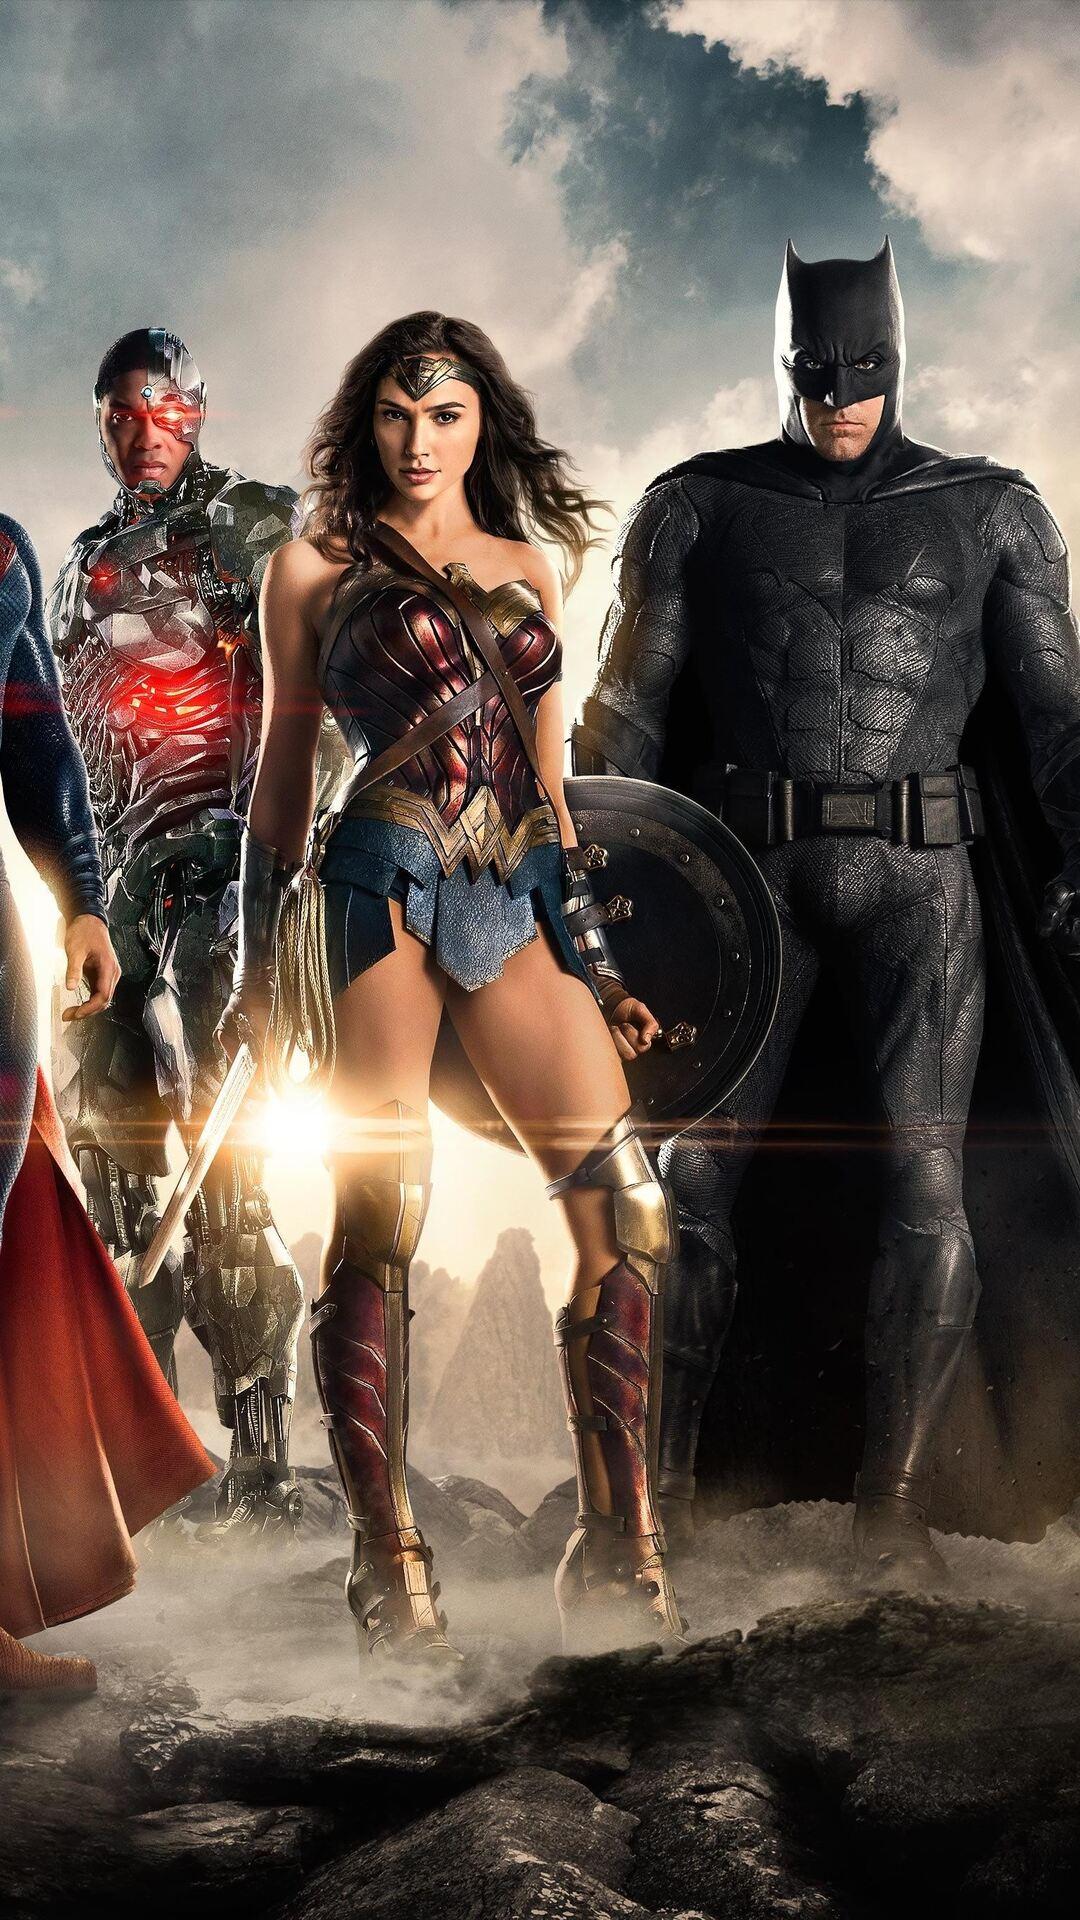 Superman Logo Hd Iphone Wallpaper 1080x1920 2017 Justice League 4k Iphone 7 6s 6 Plus Pixel